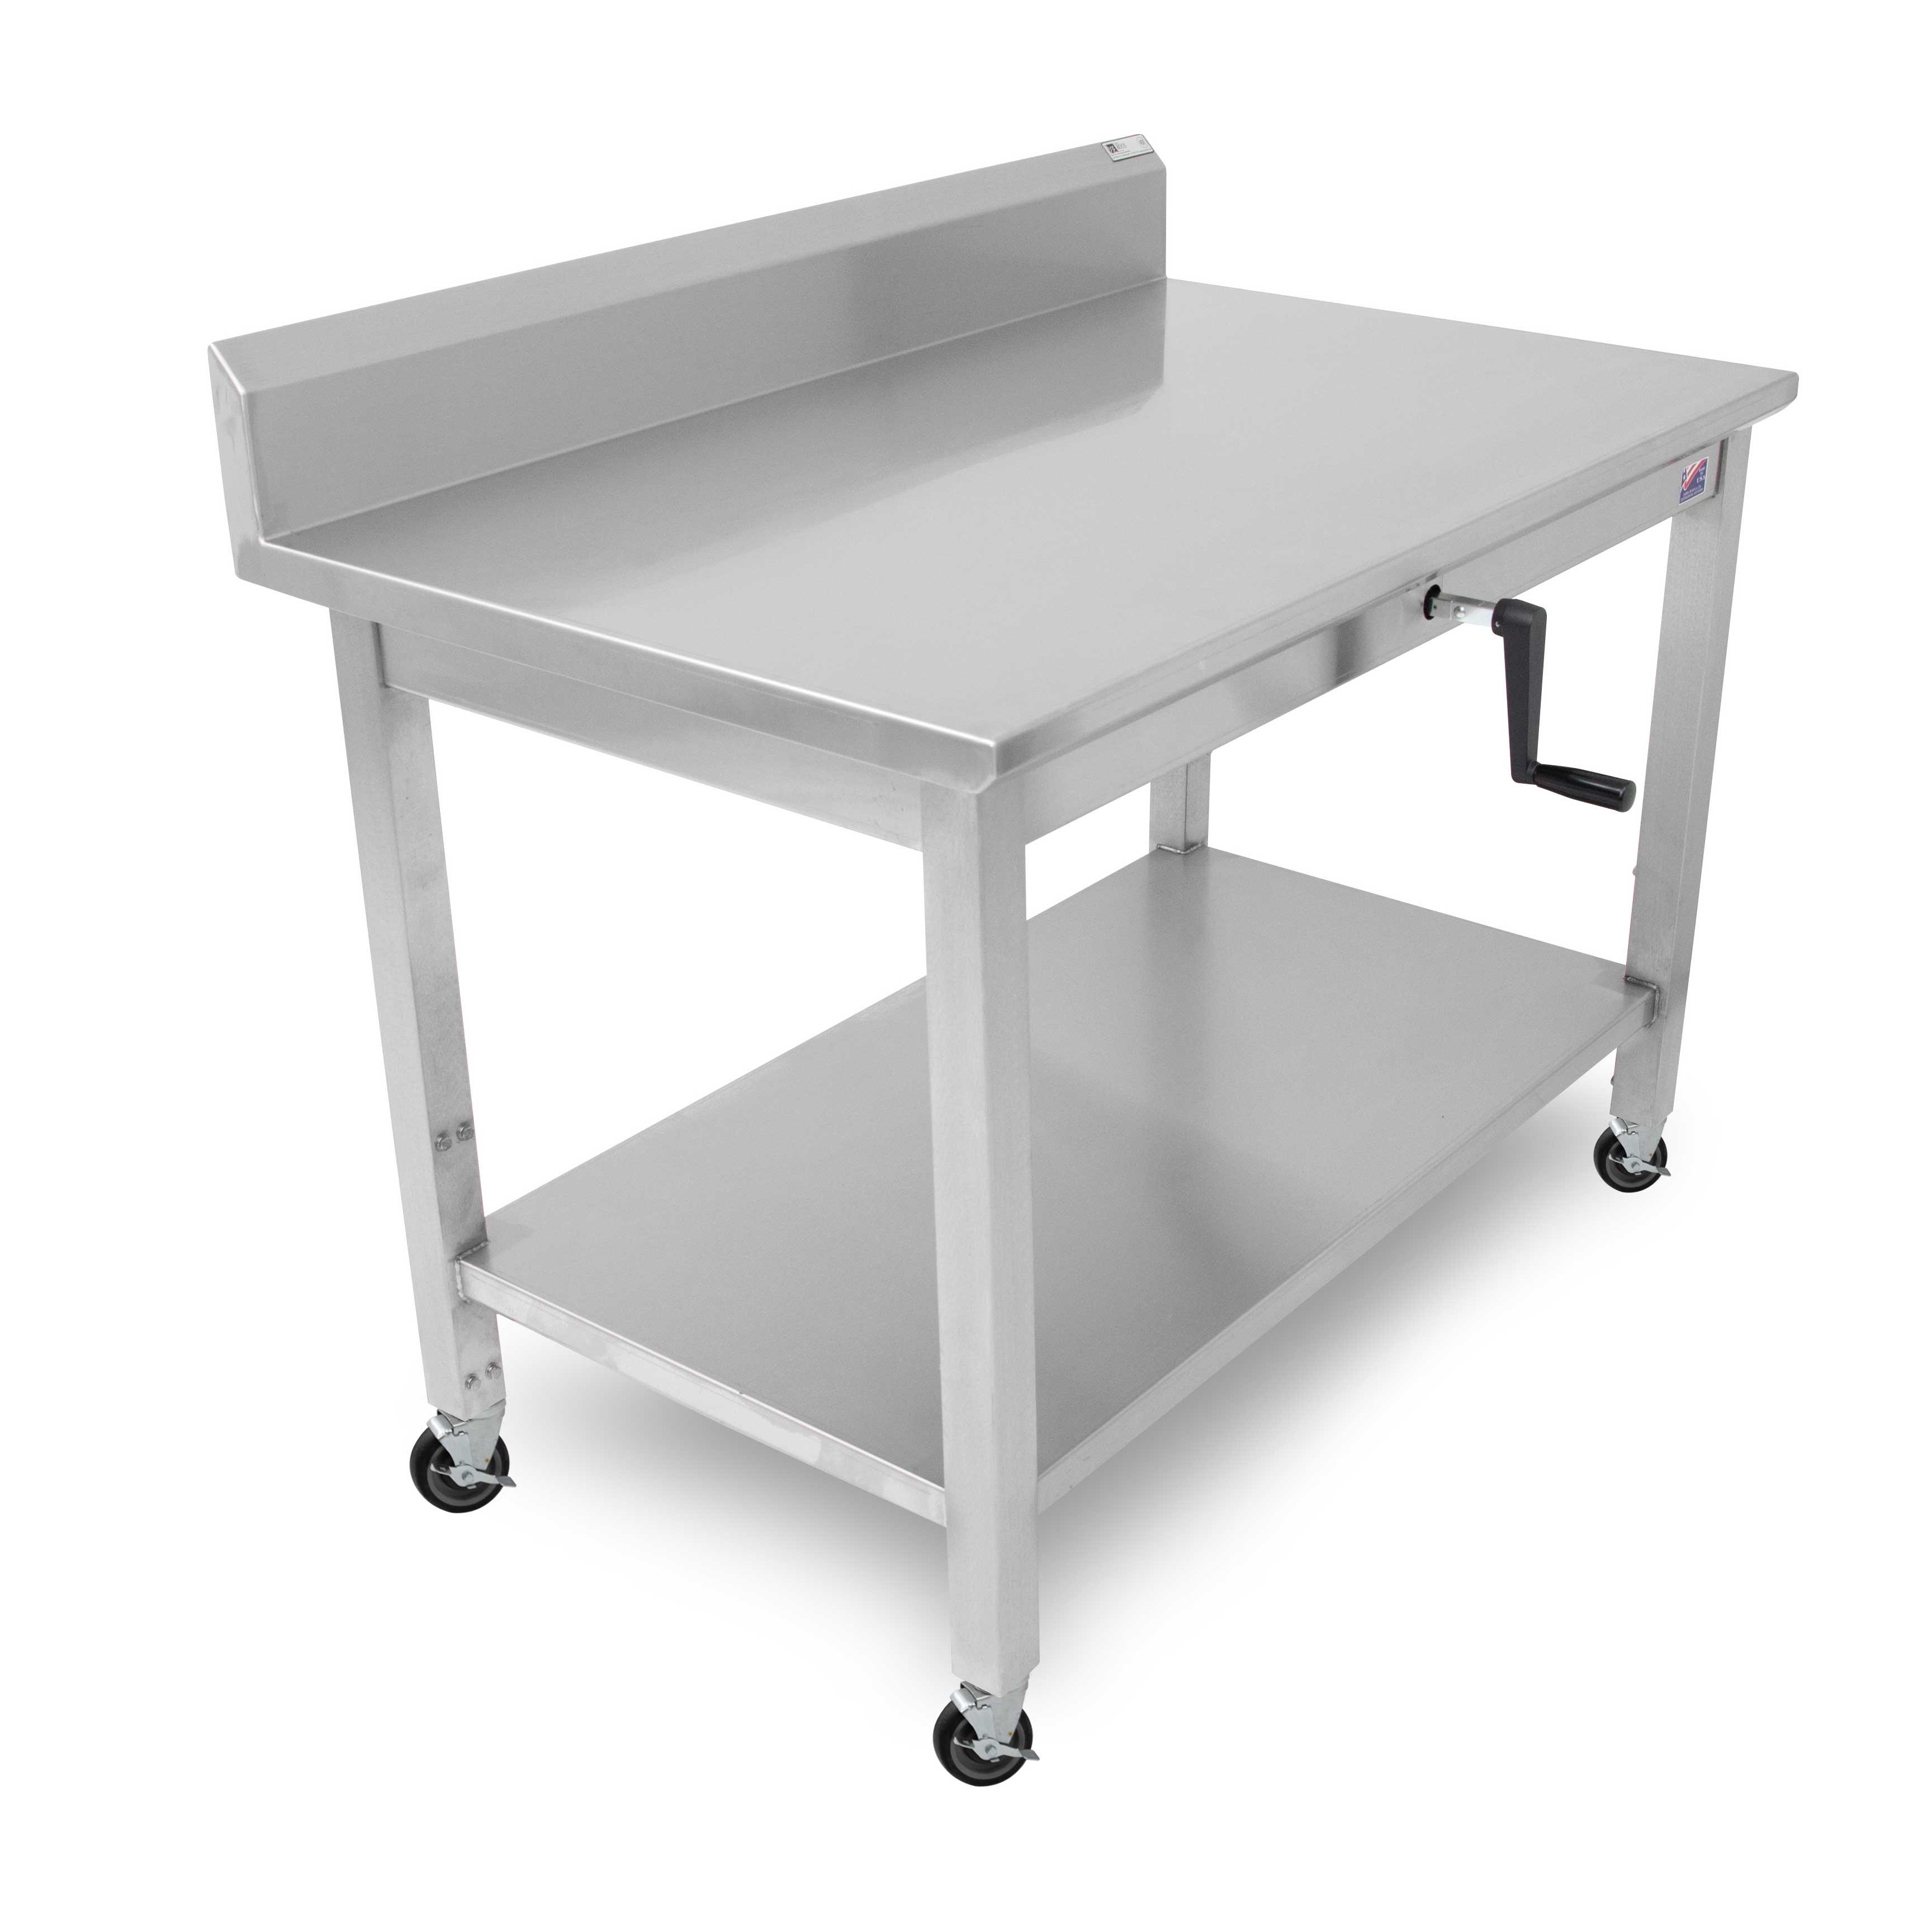 John Boos LT6R5-3072SSW-C work table,  63